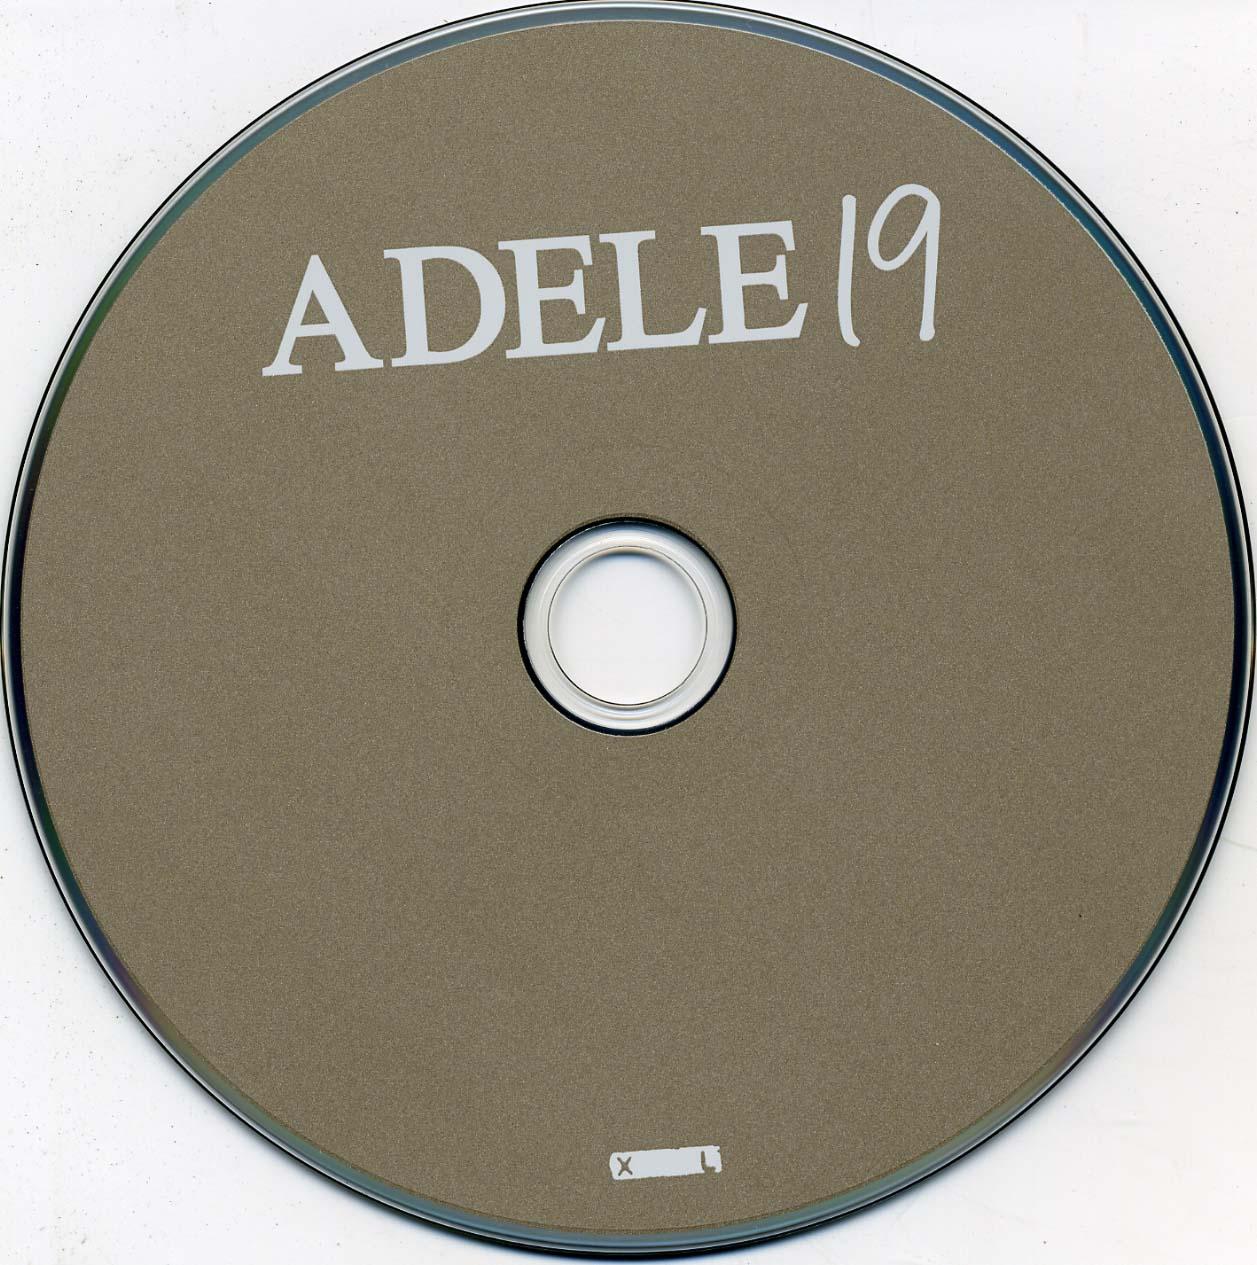 http://3.bp.blogspot.com/-uEkL0Rhx6jI/TbLVSeoSFWI/AAAAAAAABck/R-w4abgTu0g/s1600/CD.jpg